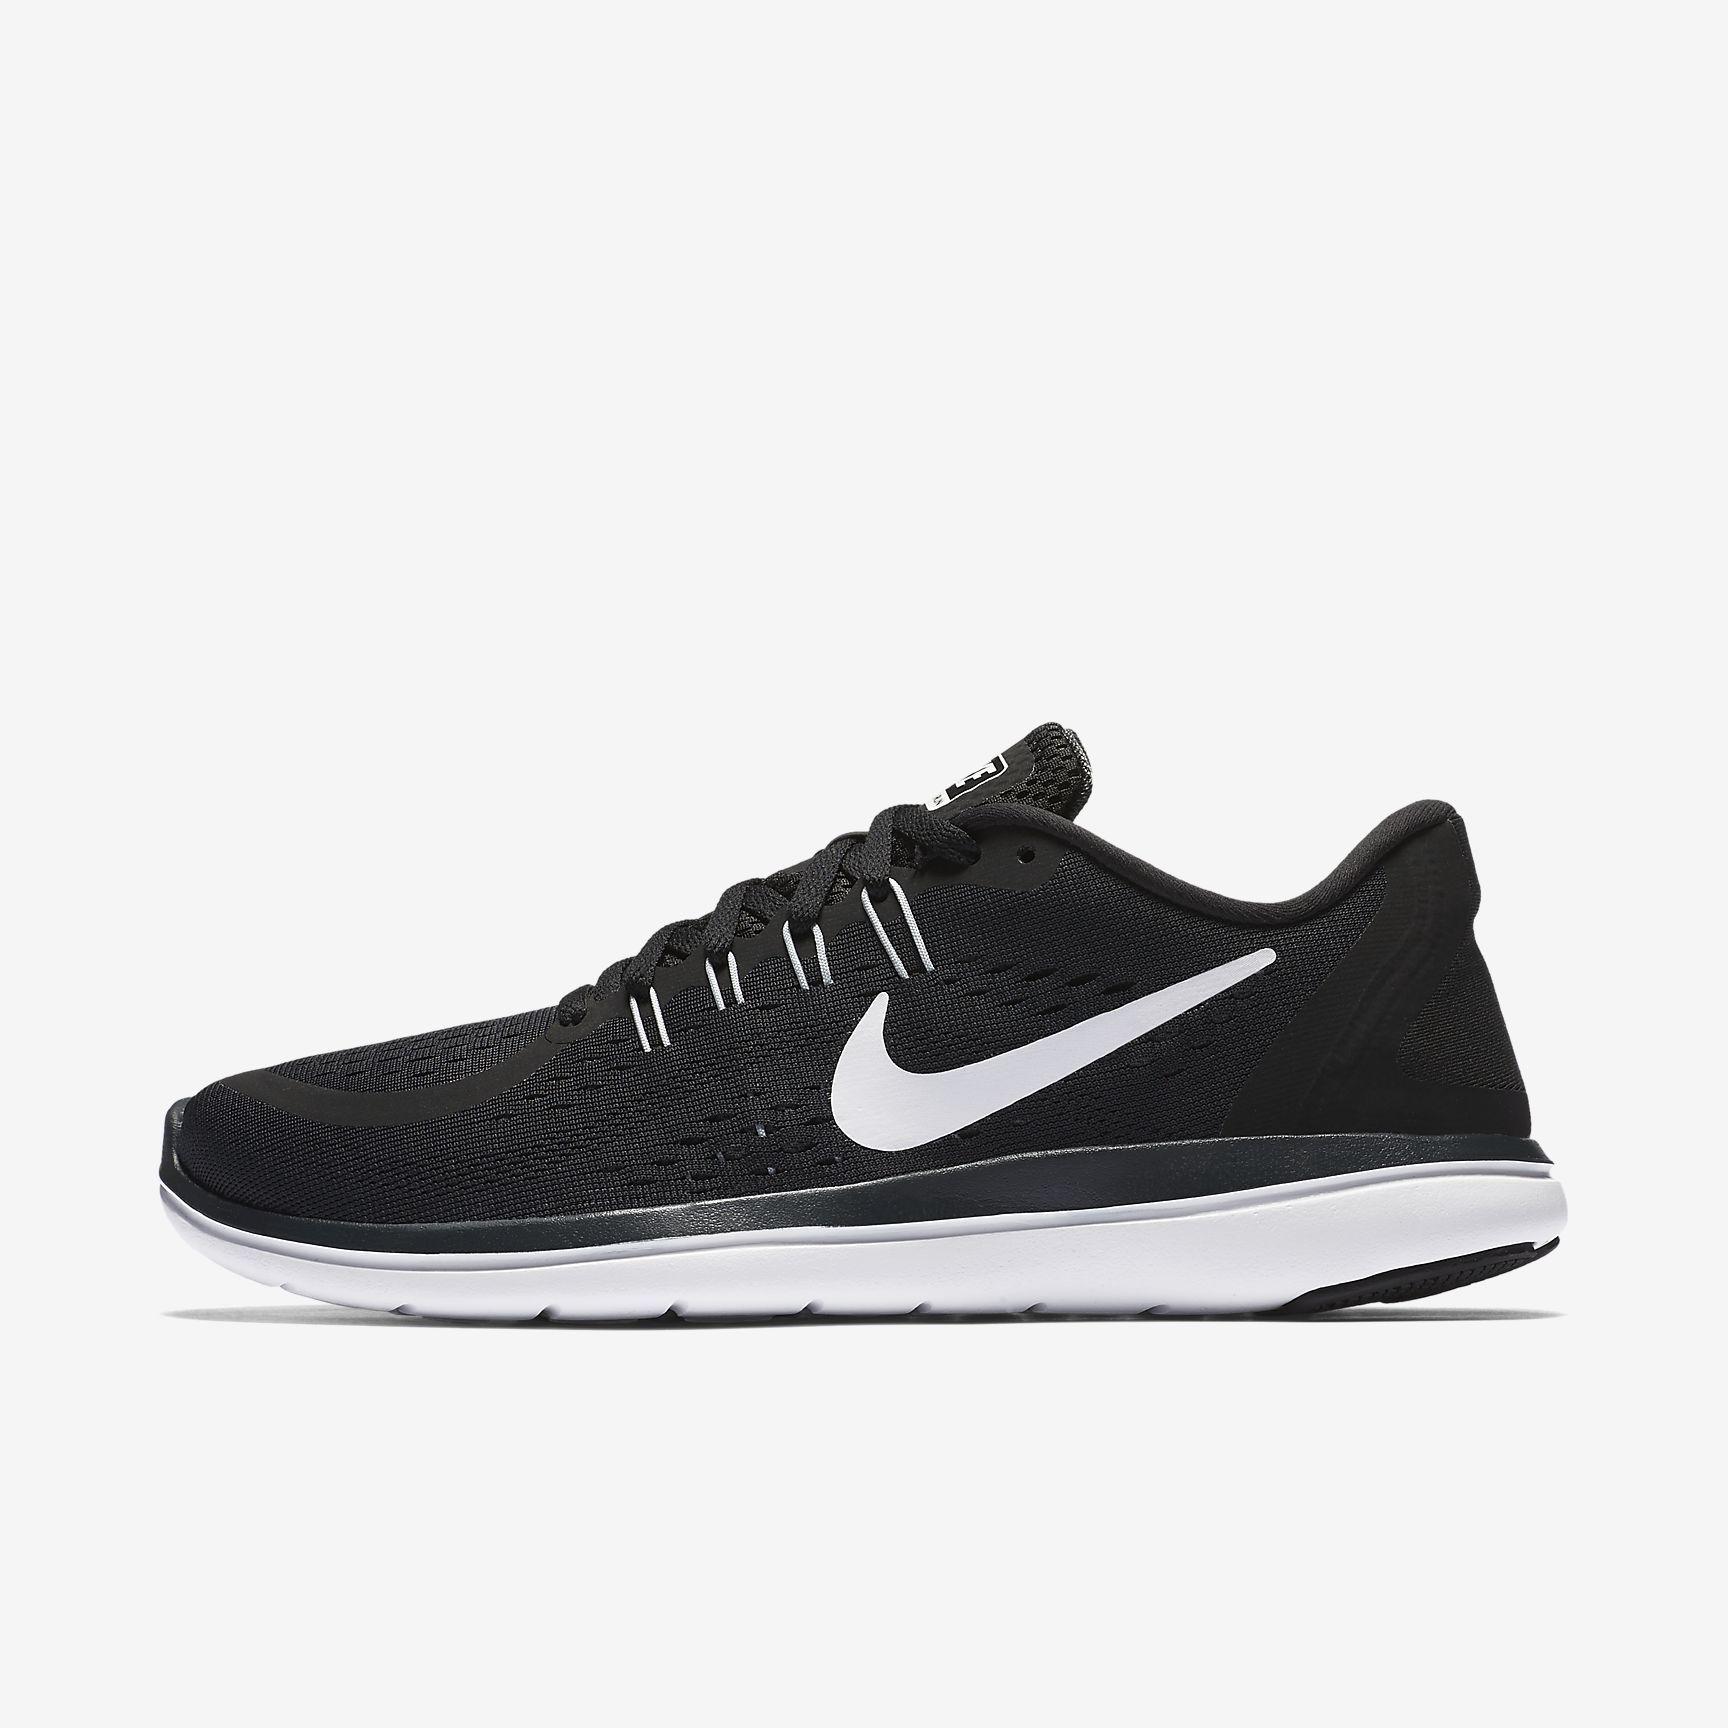 024b102950 Nike Flex 2017 Run Womens Running Shoes Nike Flex 2018 | Sri Lanka Army